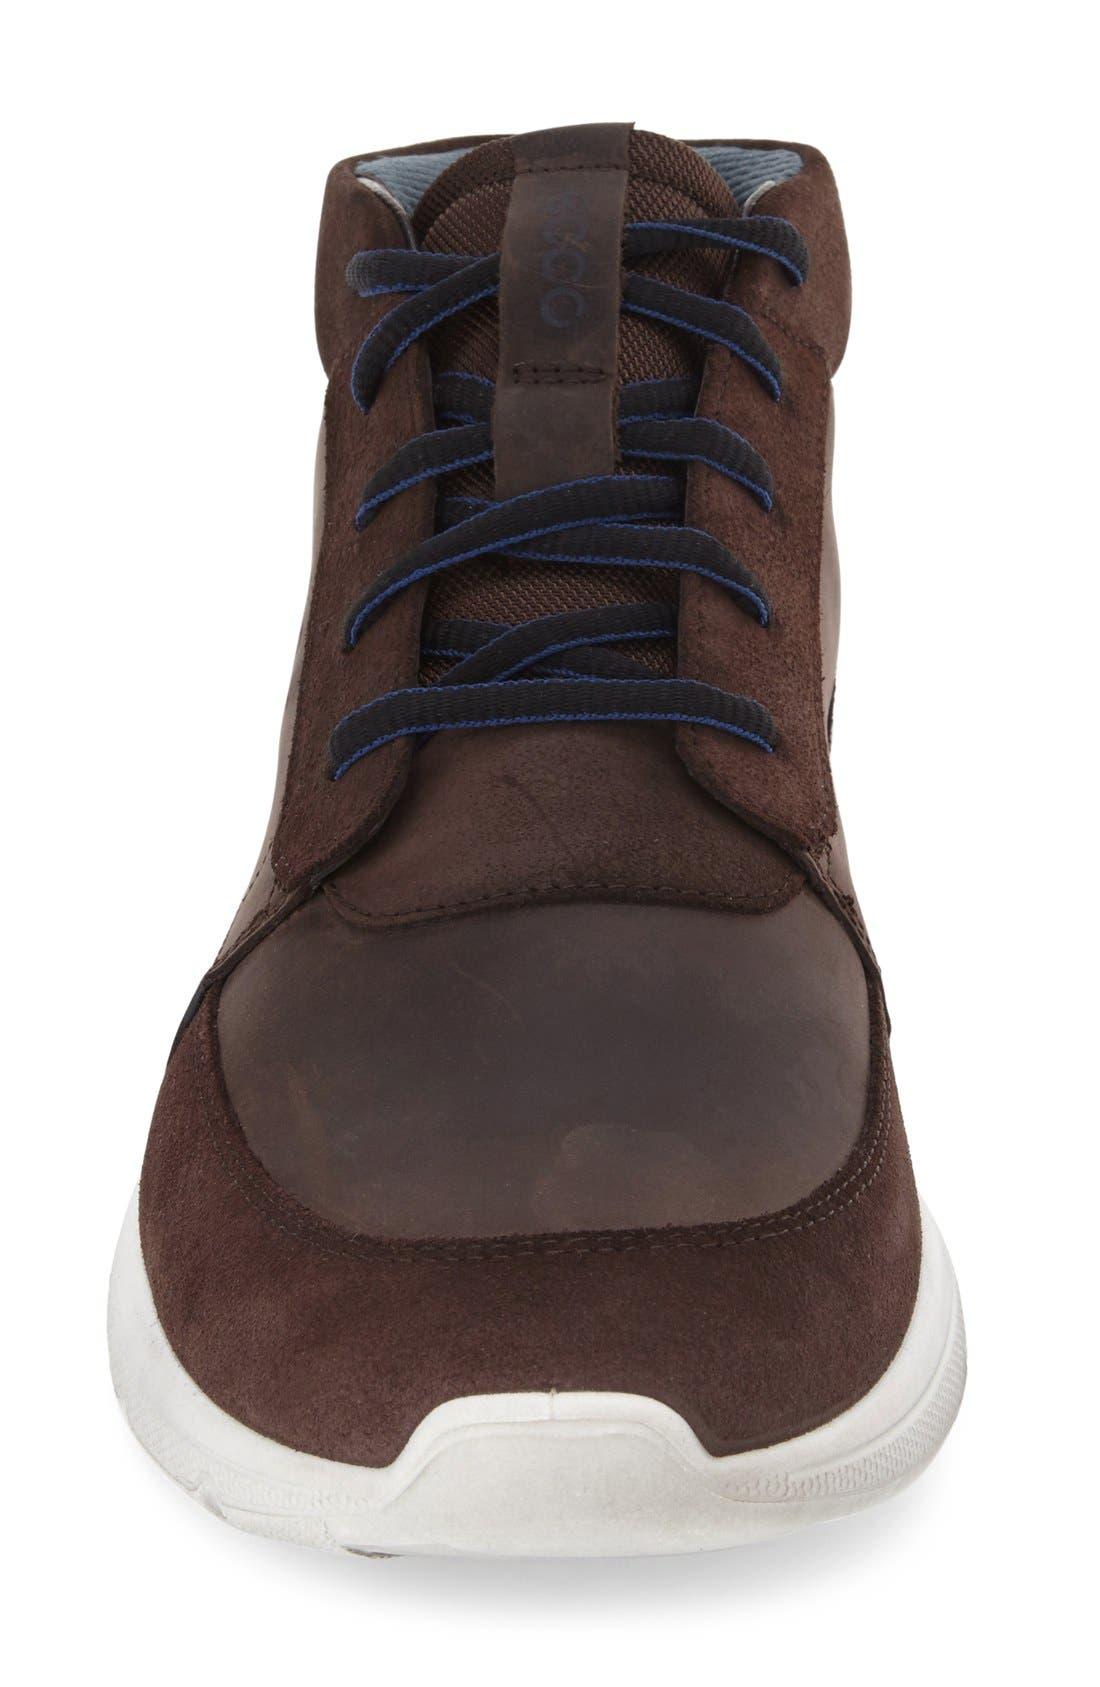 'Irondale Retro' High Top Sneaker,                             Alternate thumbnail 3, color,                             206